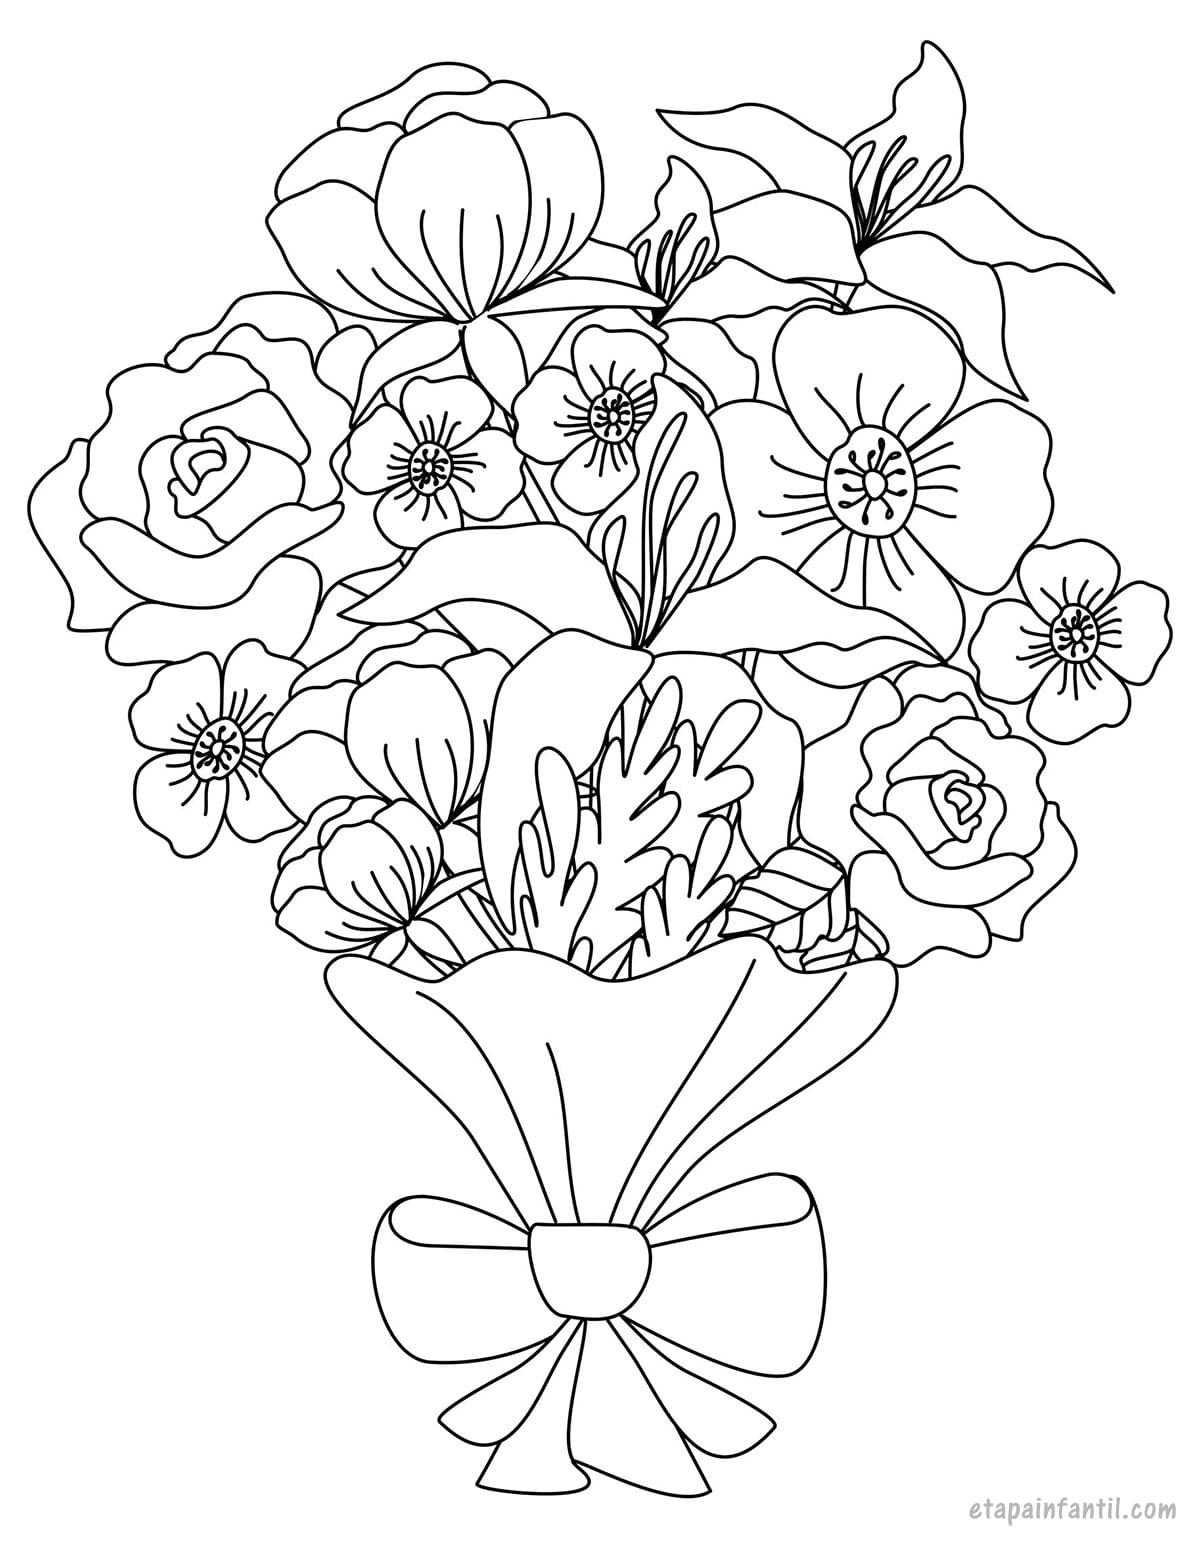 Dibujo de ramo de flores colorear